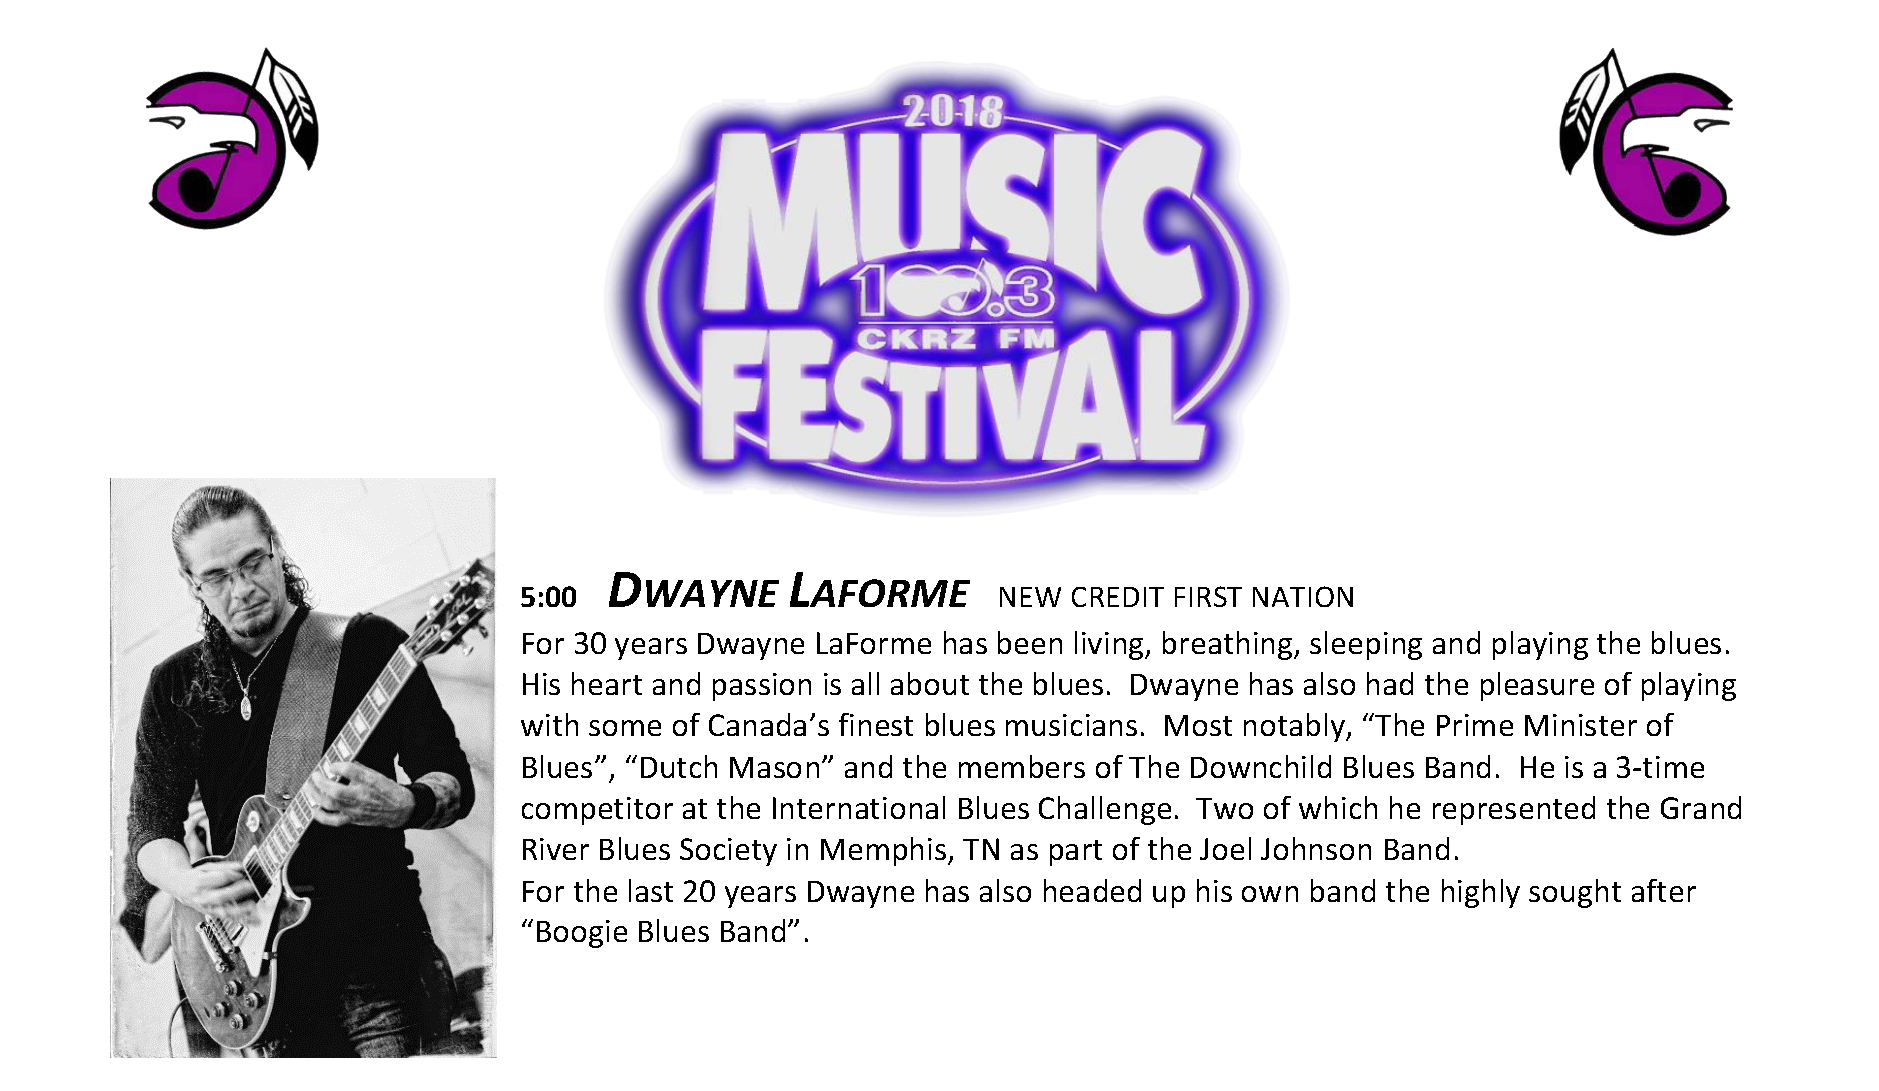 7. Music Fest Lineup - Dwayne